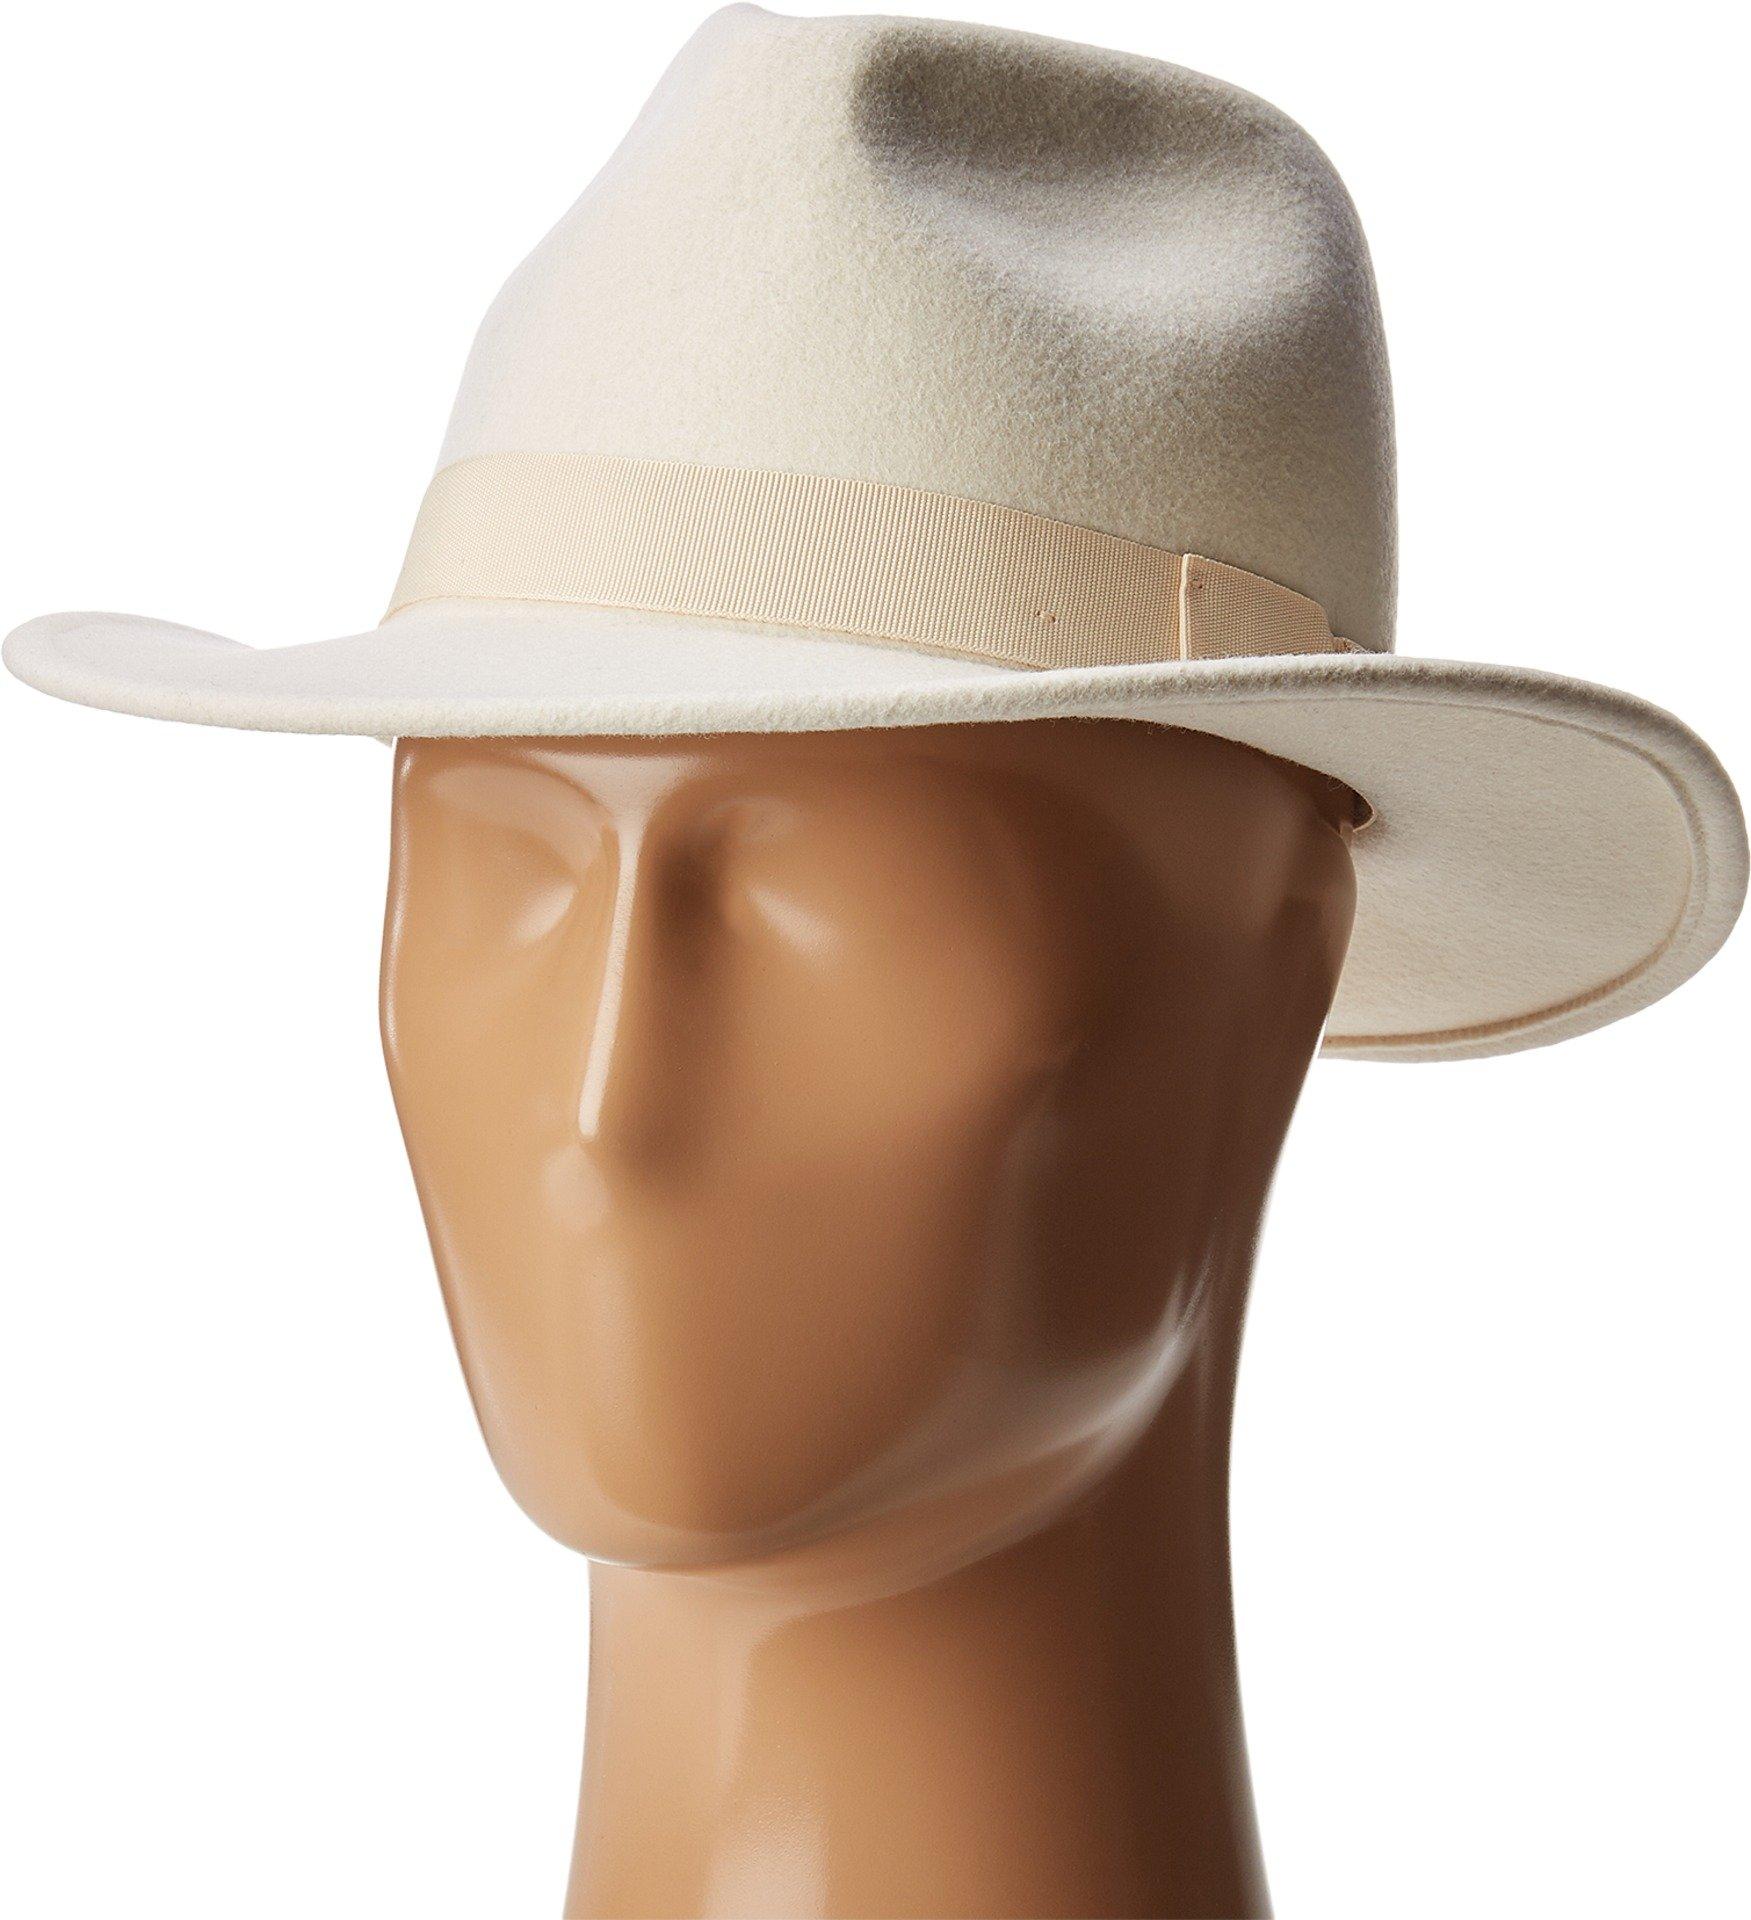 San Diego Hat Company Women's WFH8039 Felt Fedora Hat Ivory Hat